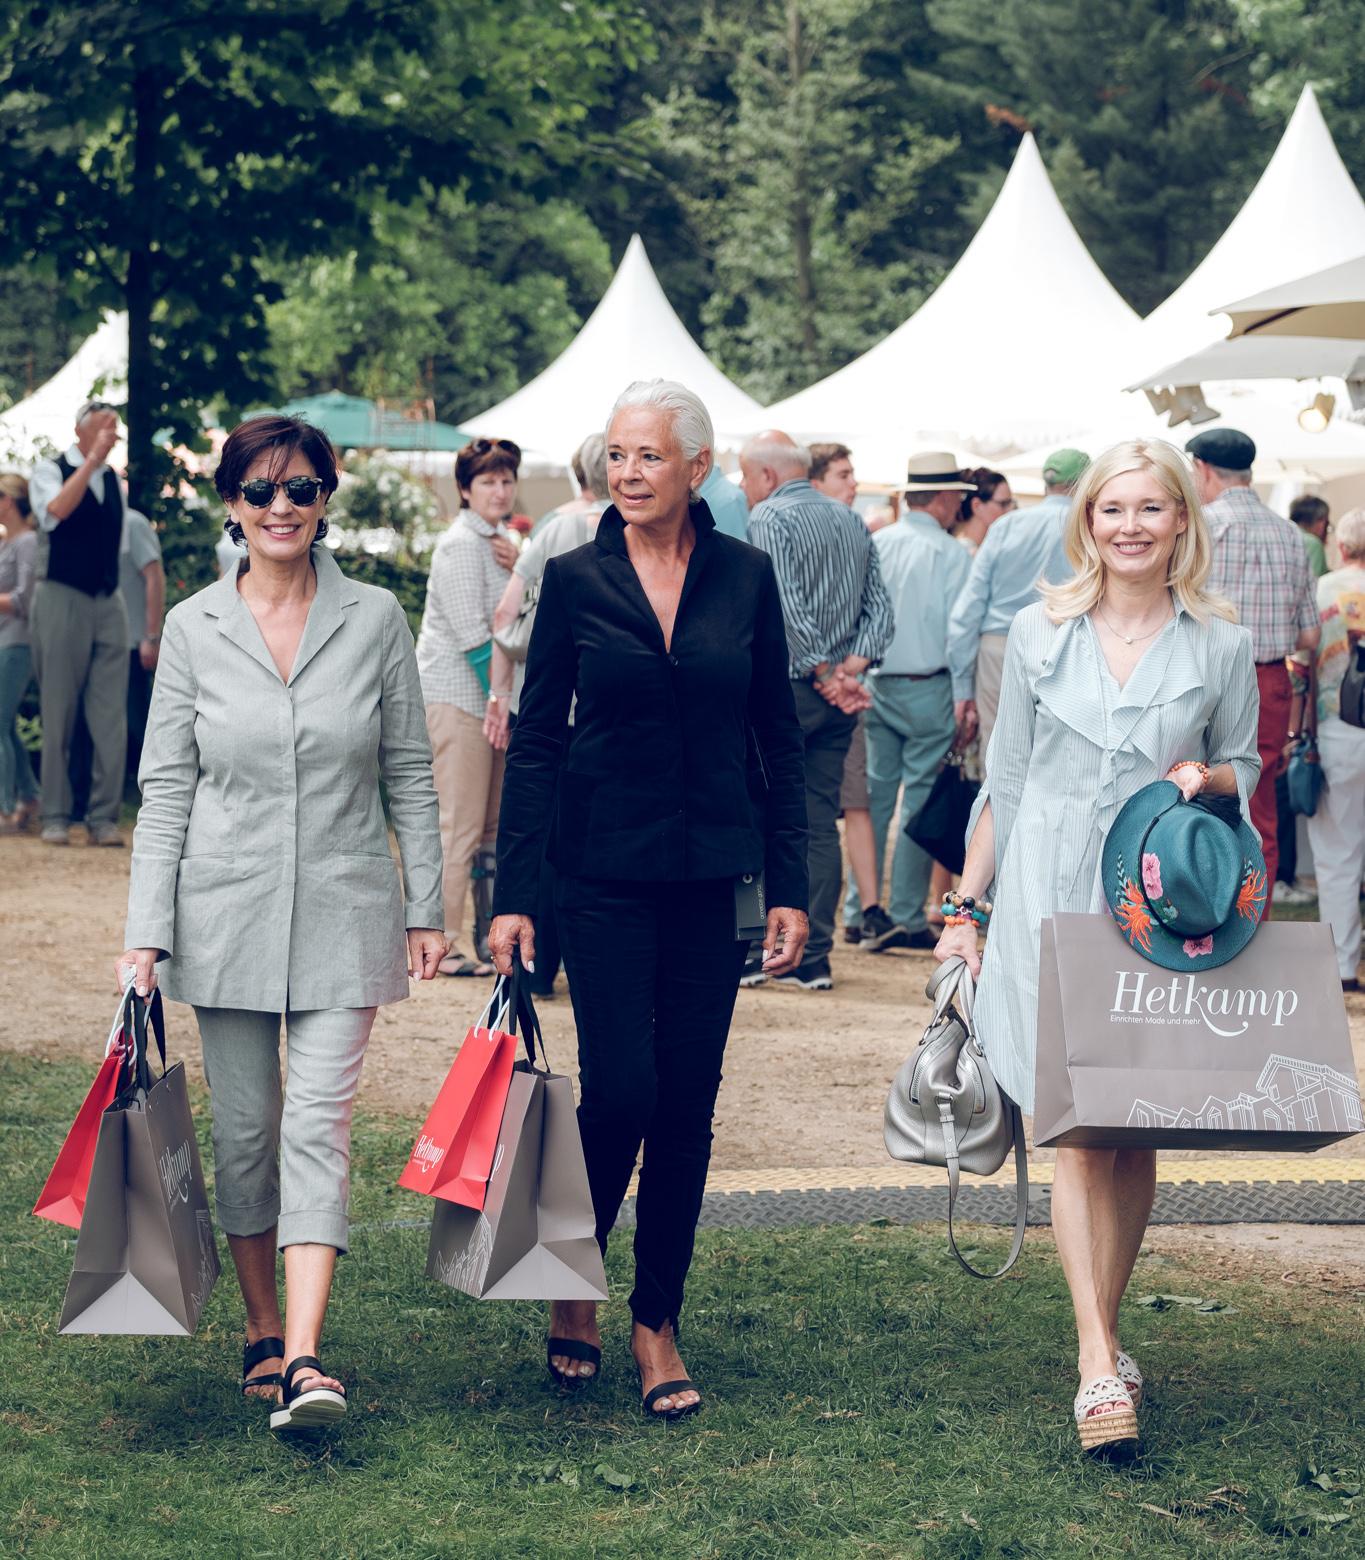 Schloss Lembeck Landpartie, Hetkam Raesfeld, Petra Dieners, Pia Hendriks in Annette Görtz, Lisa Schauf in Annette Götz,Fashion-Blog, Lieblingsstil.com, 3